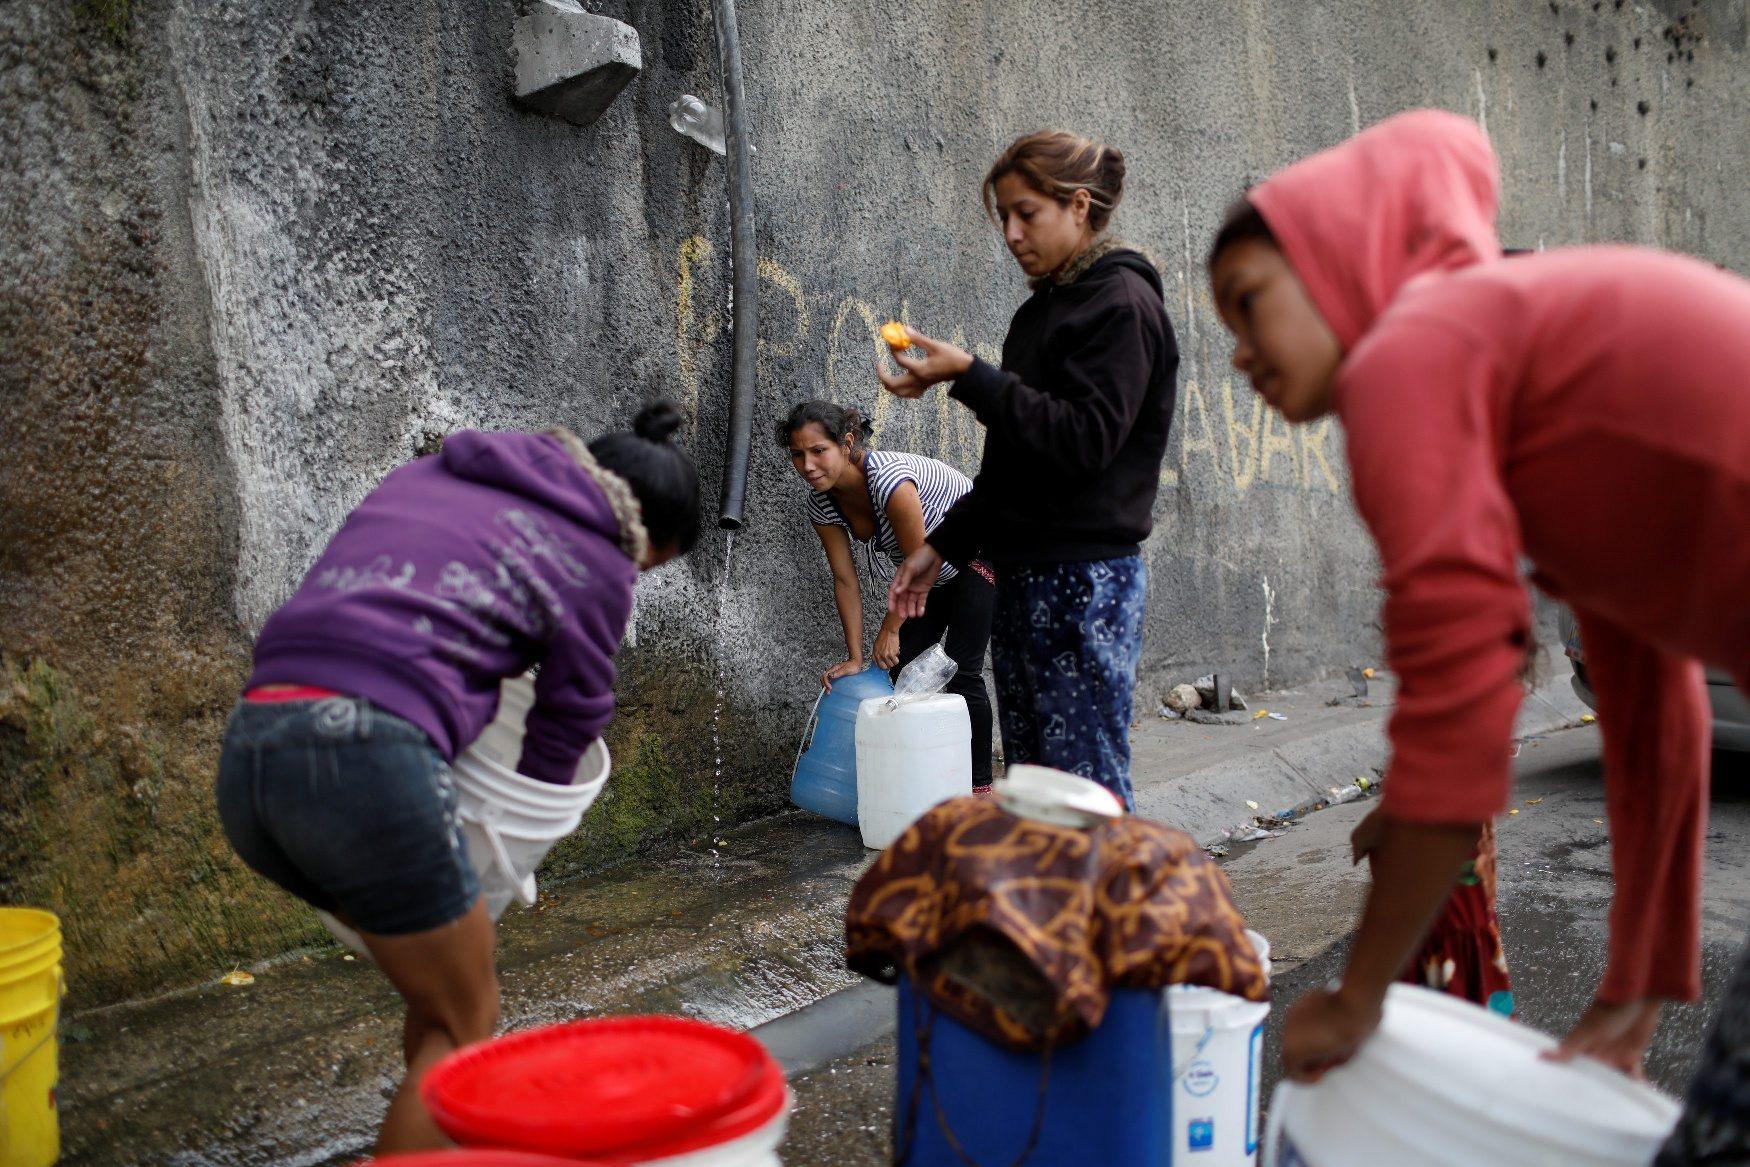 2018-08-15T120302Z_2008168851_RC1B31B607B0_RTRMADP_3_VENEZUELA-WATER